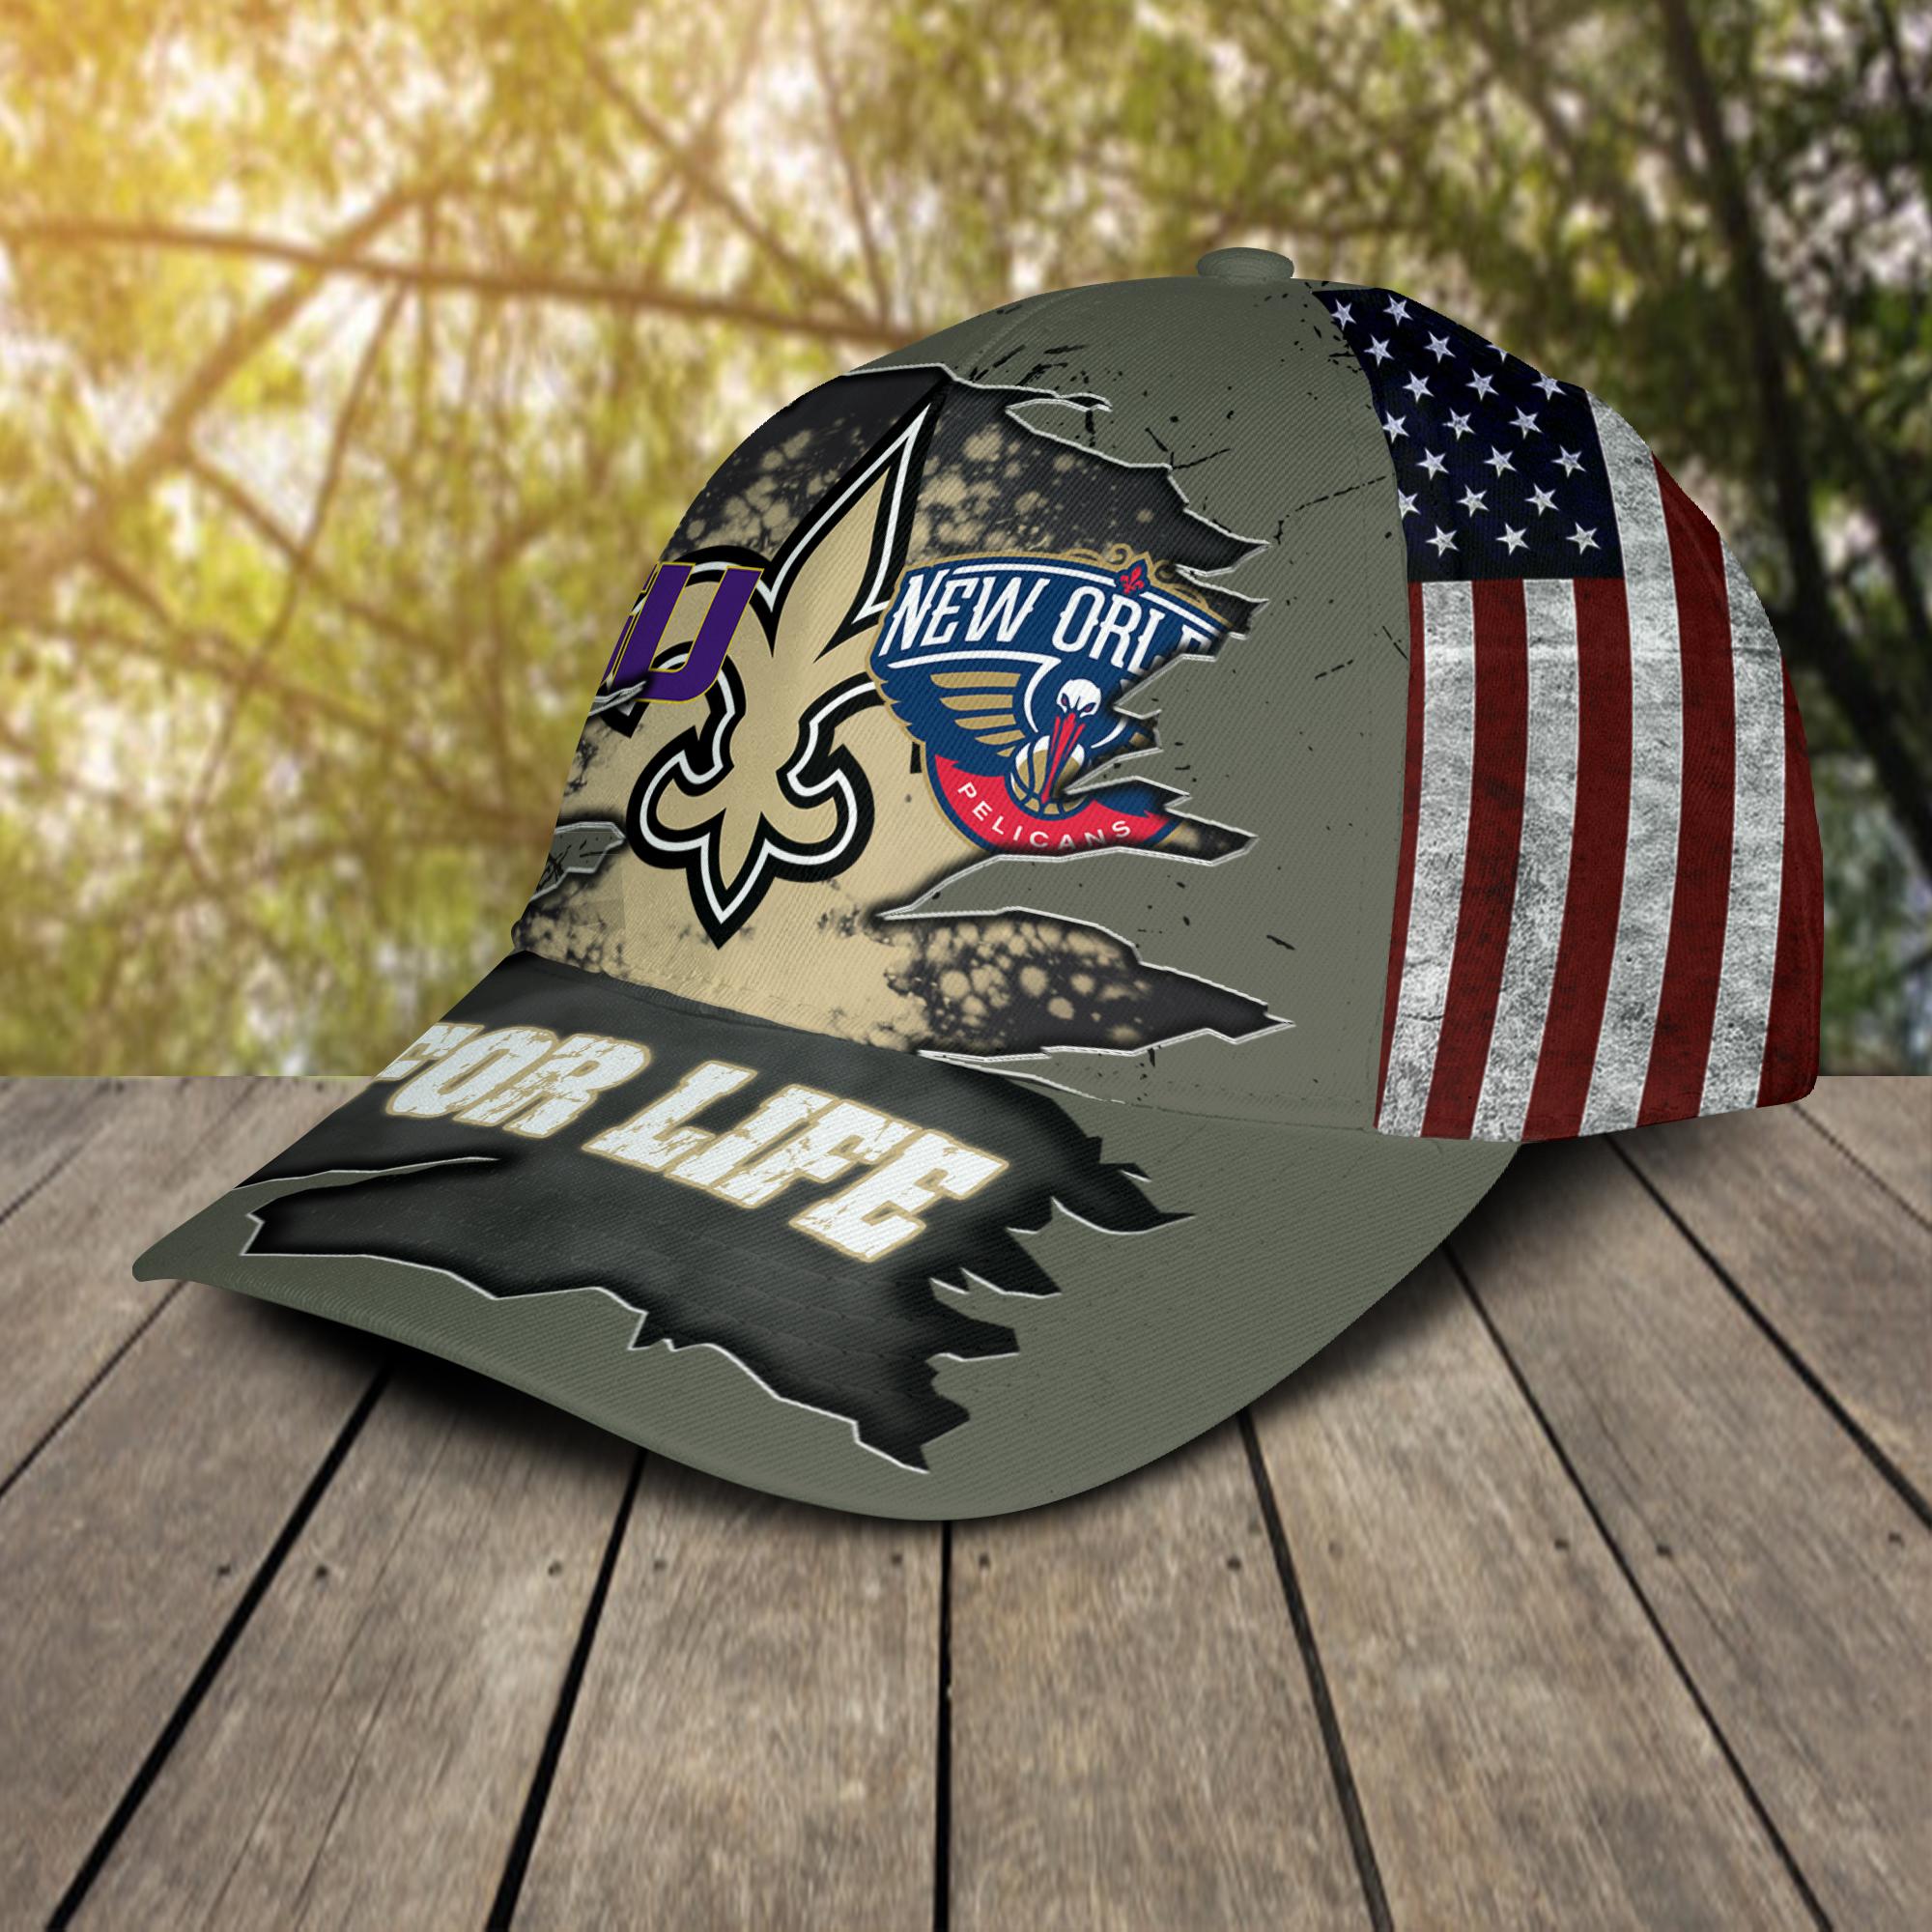 New Orleans Saints New Orleans Pelicans LSU Tigers For Life Hat Cap -2